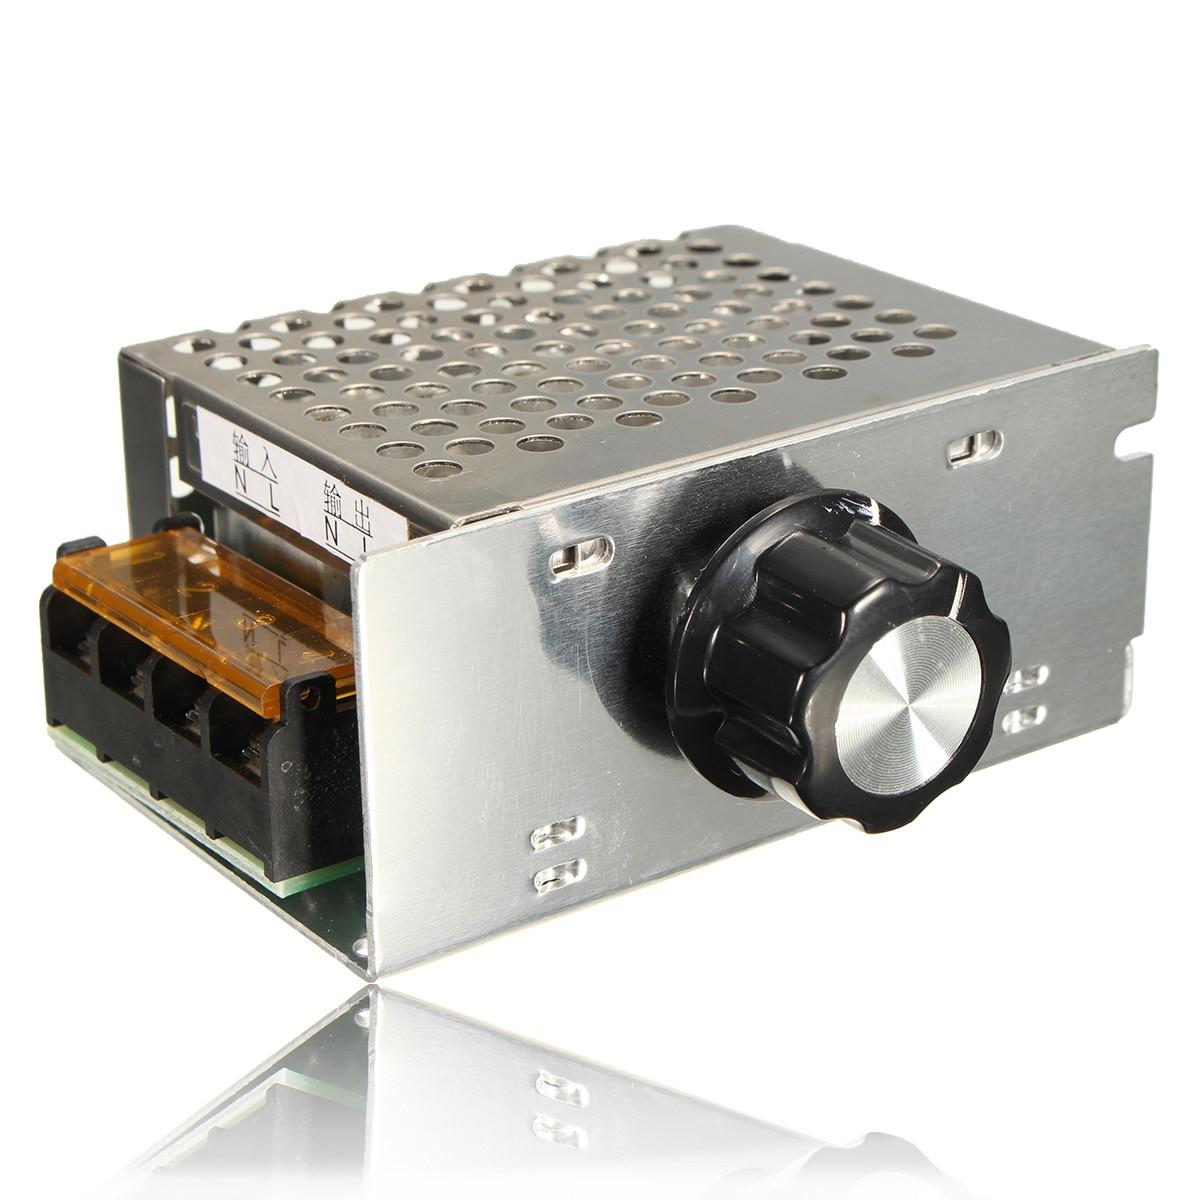 Professional Voltage Regulators 25a 4000w 220v High Power